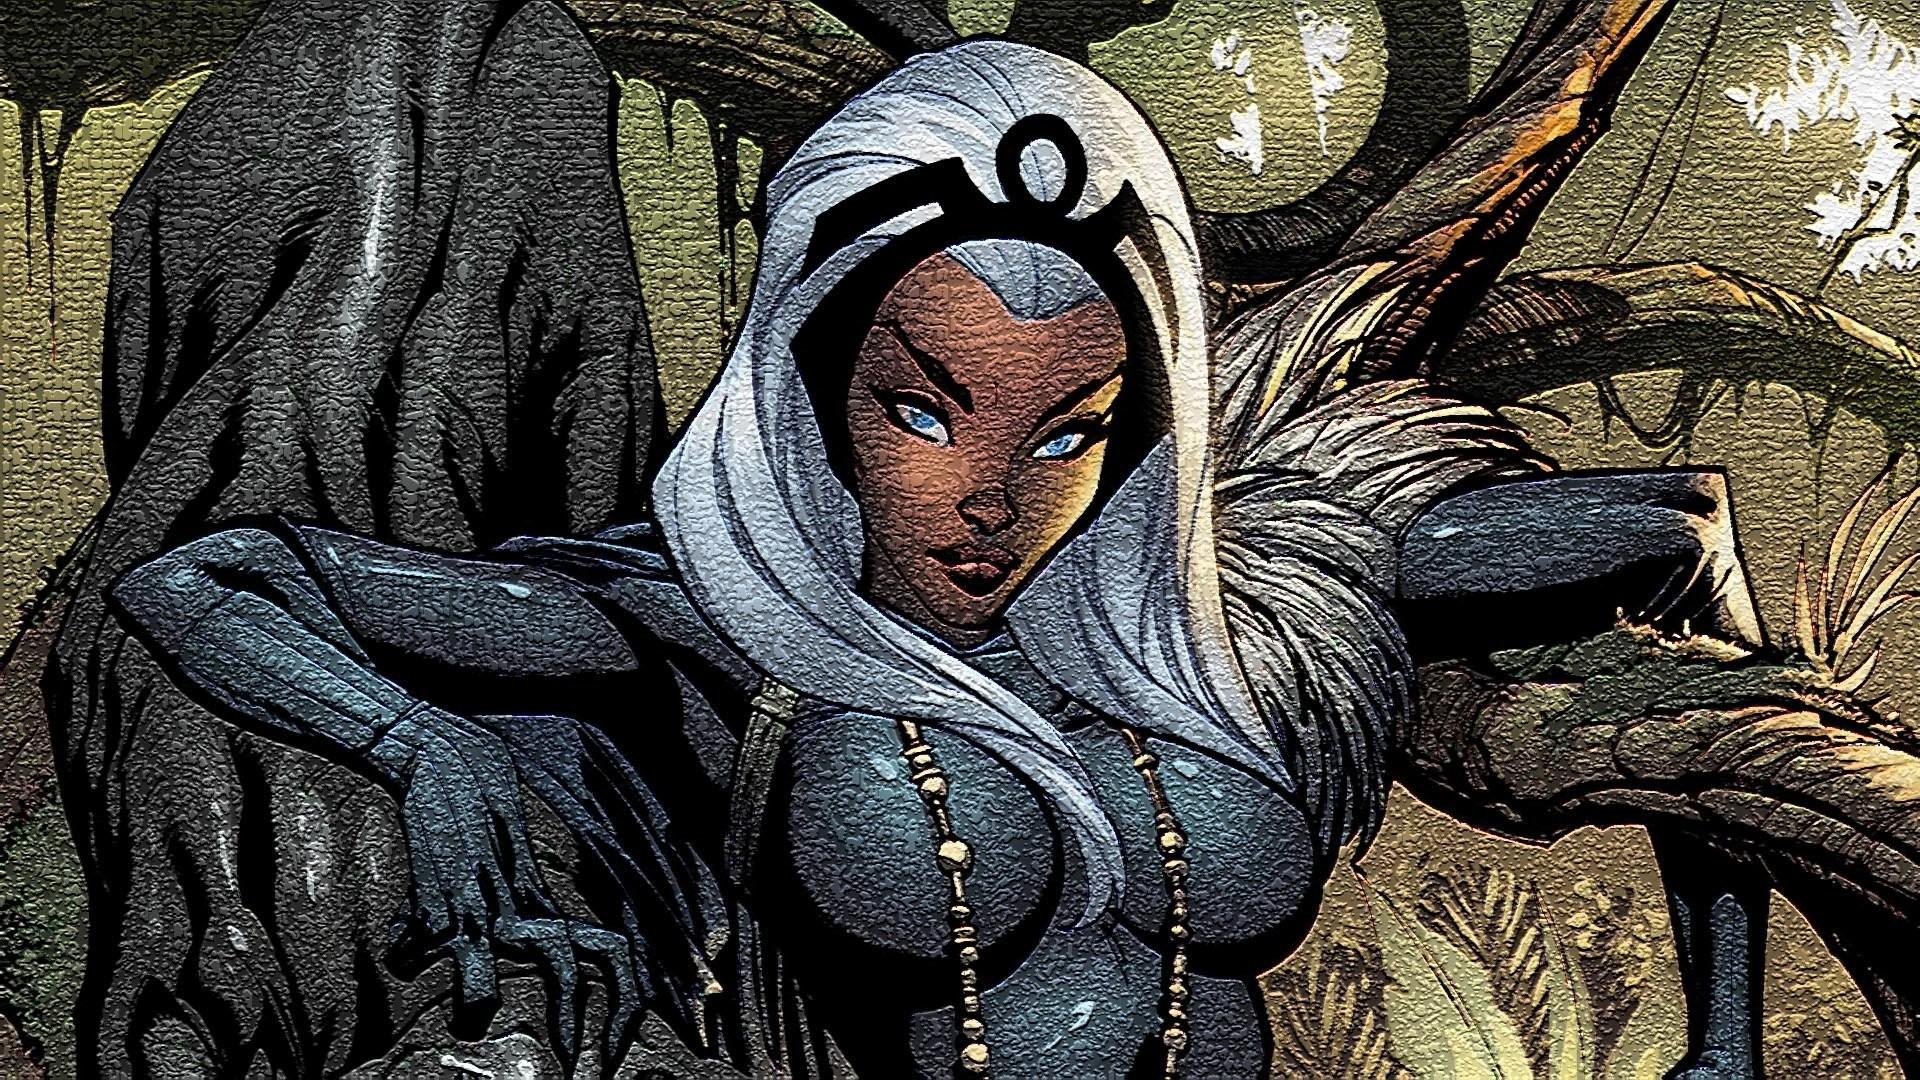 Fondos 4k Hd De Panteras Negras: Black Panther Marvel HD Wallpaper (73+ Images